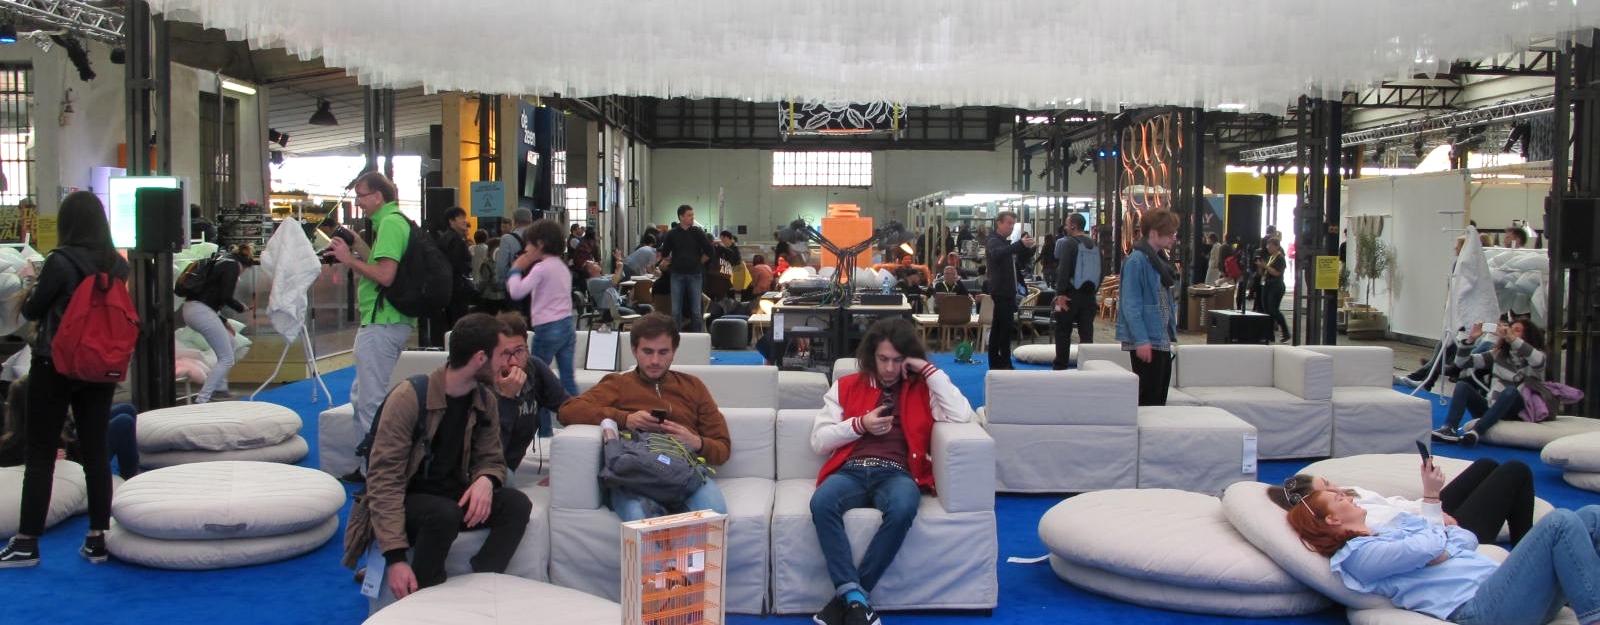 Ikea Hacks Ikea For Milan Design Week 2017 Core77